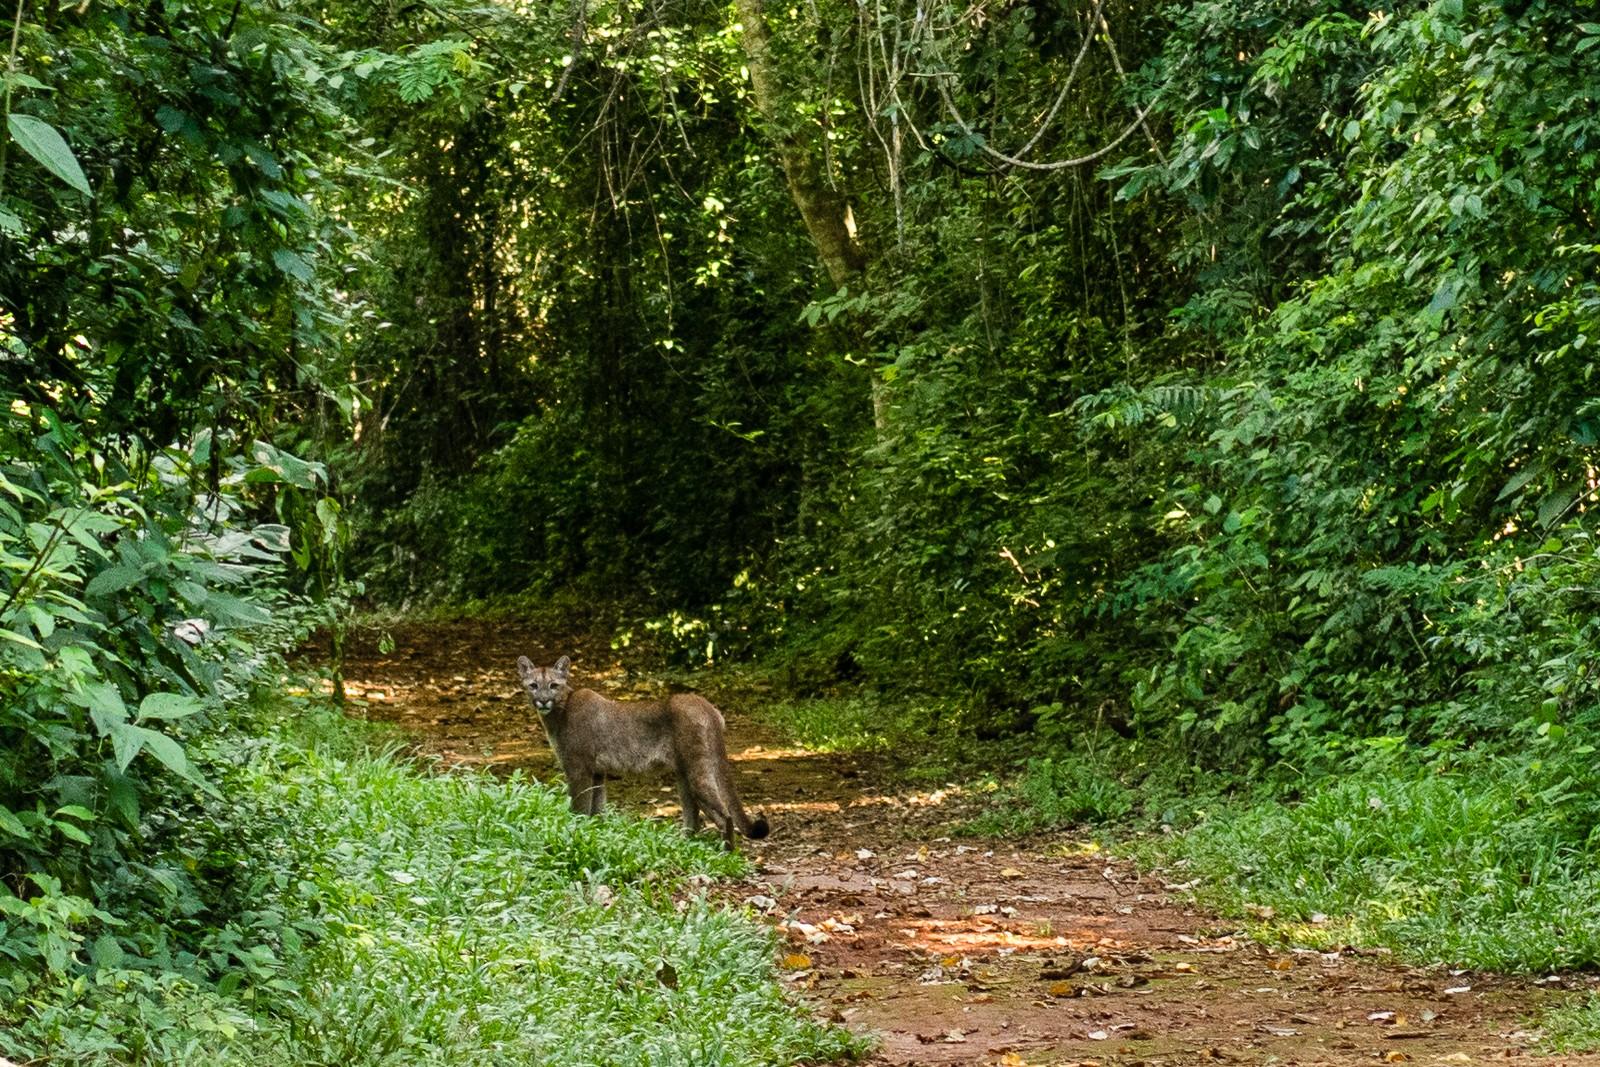 Suçuarana é flagrada no Parque Estadual Vassununga, no interior de SP (Foto: Humberto Mauro/VC no TG)